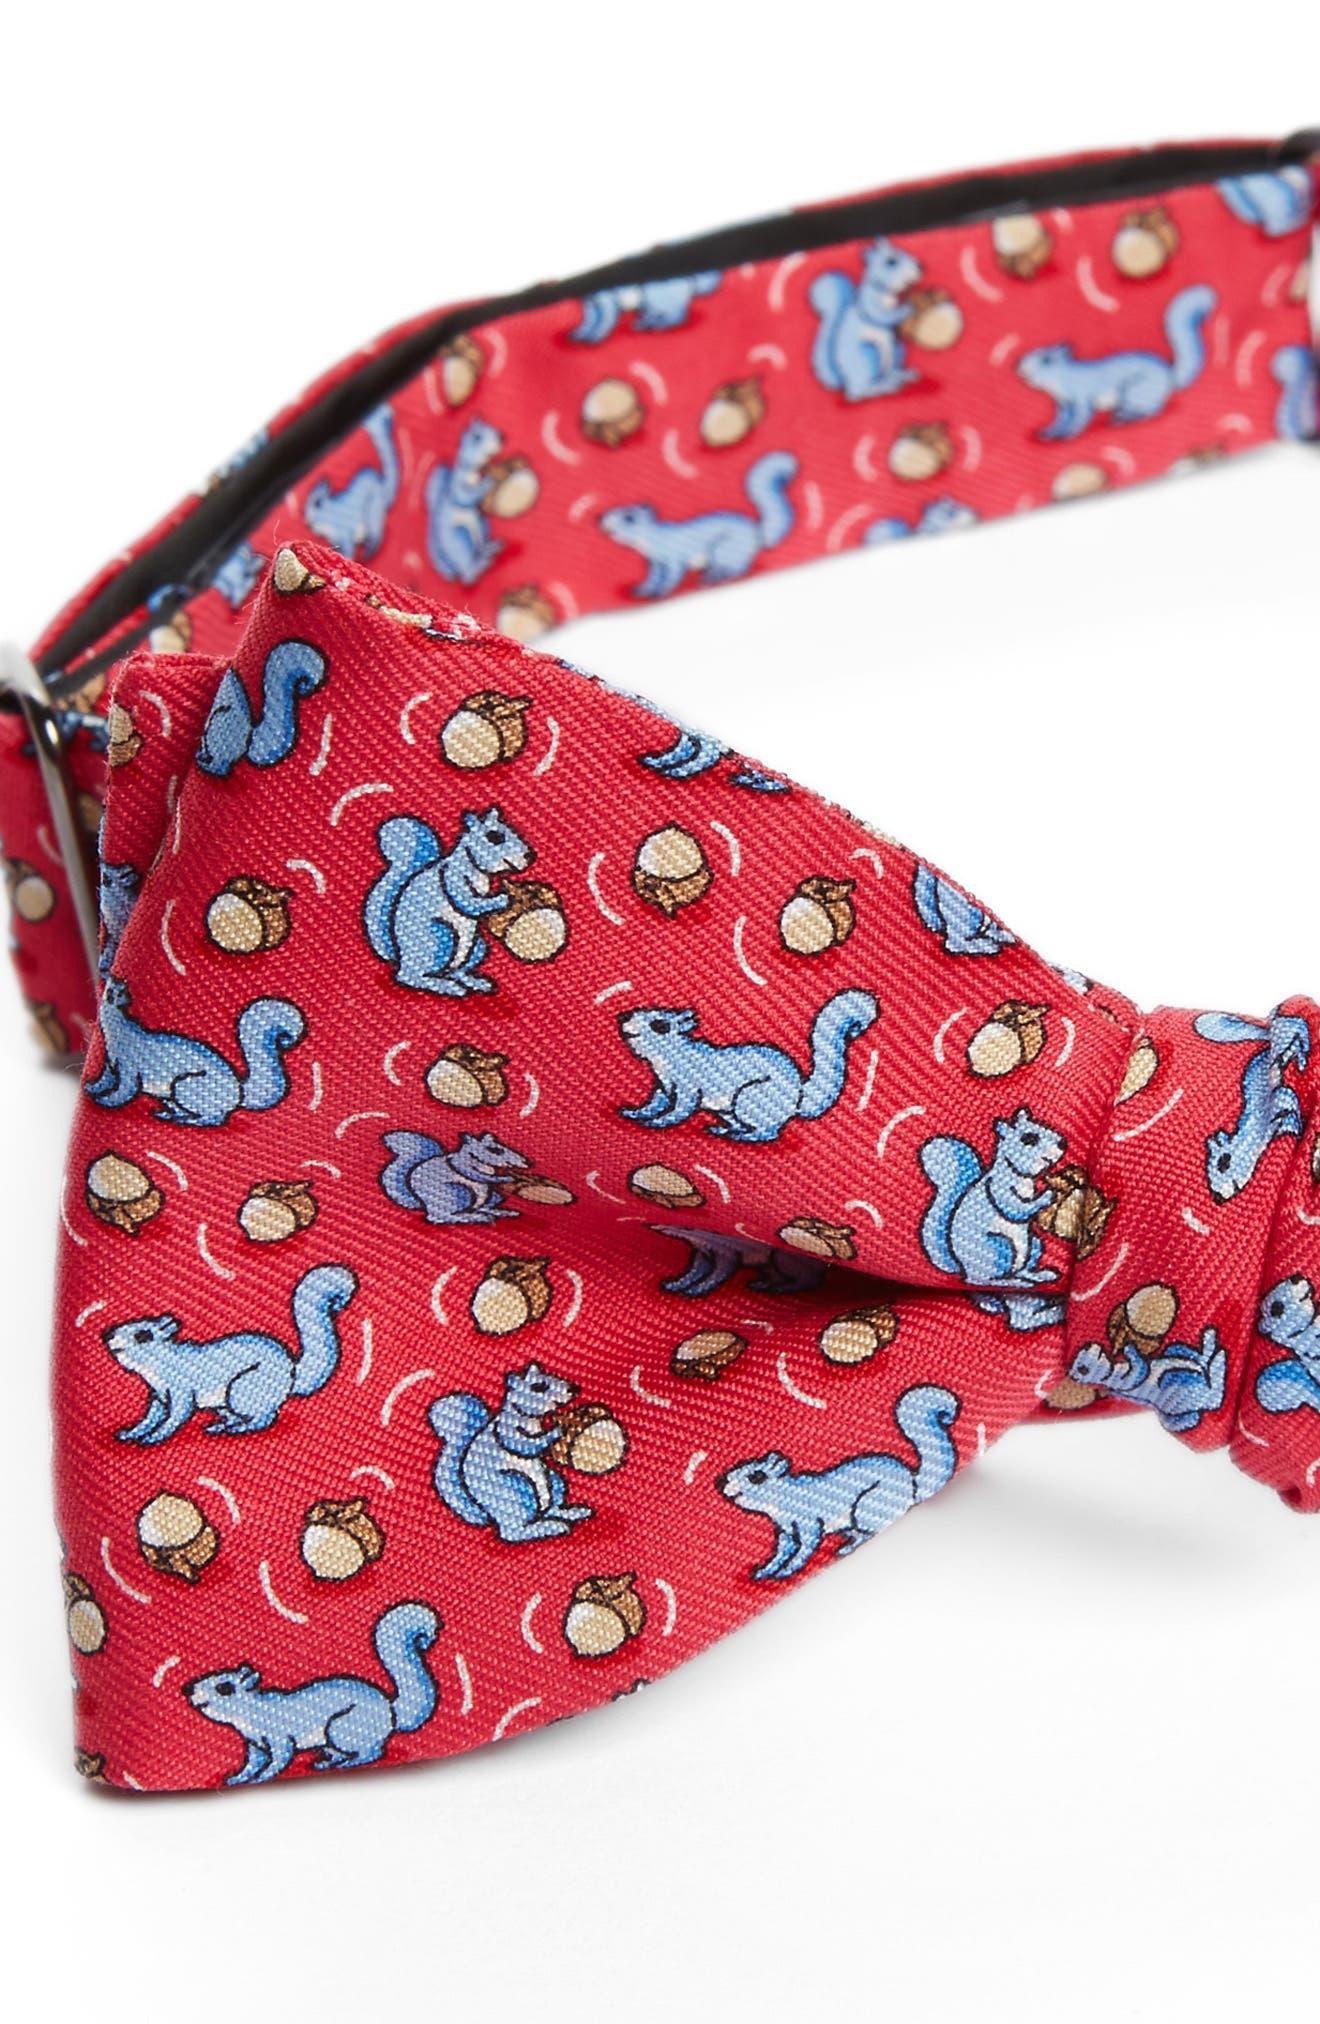 Squirrel Silk Bow Tie,                             Alternate thumbnail 3, color,                             660